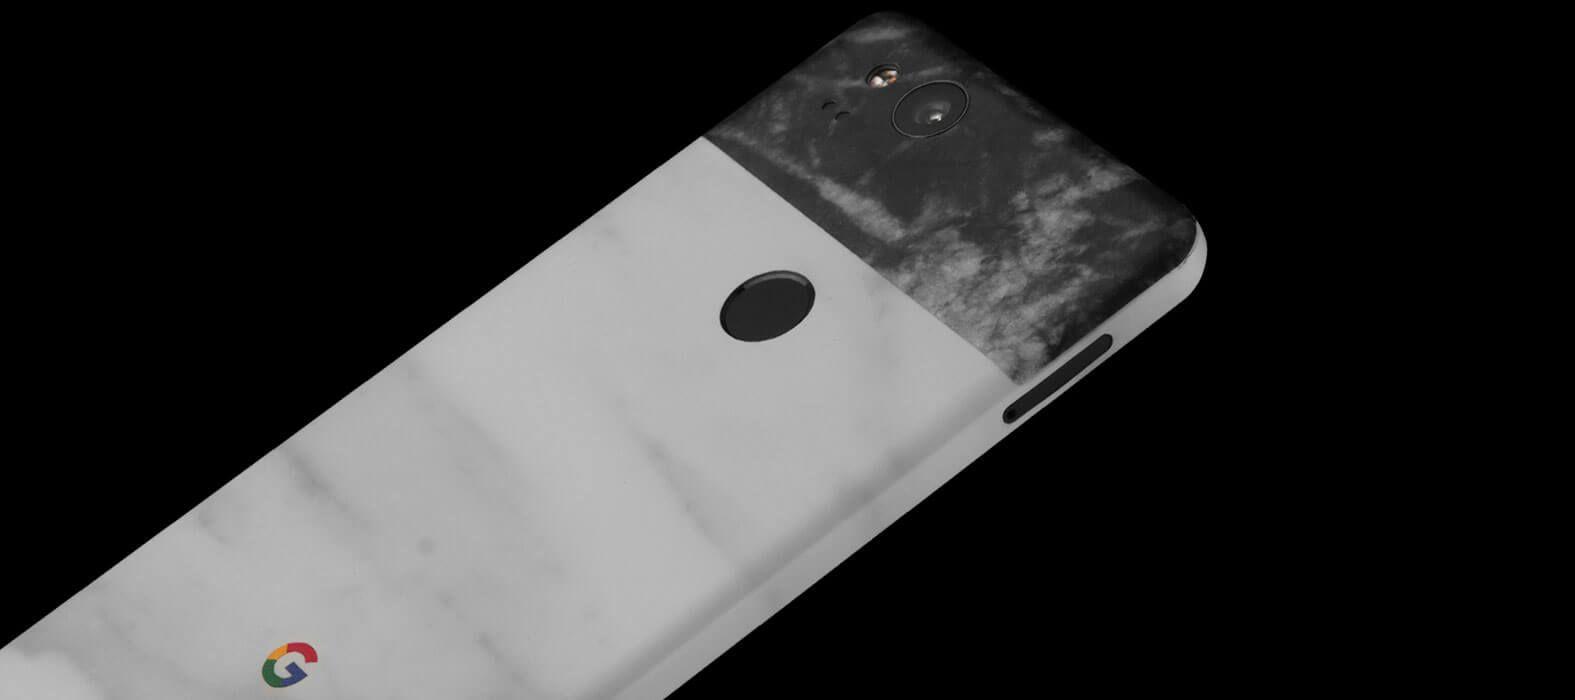 Pixel 2 Wraps, Skins, Decals - White Marble Split